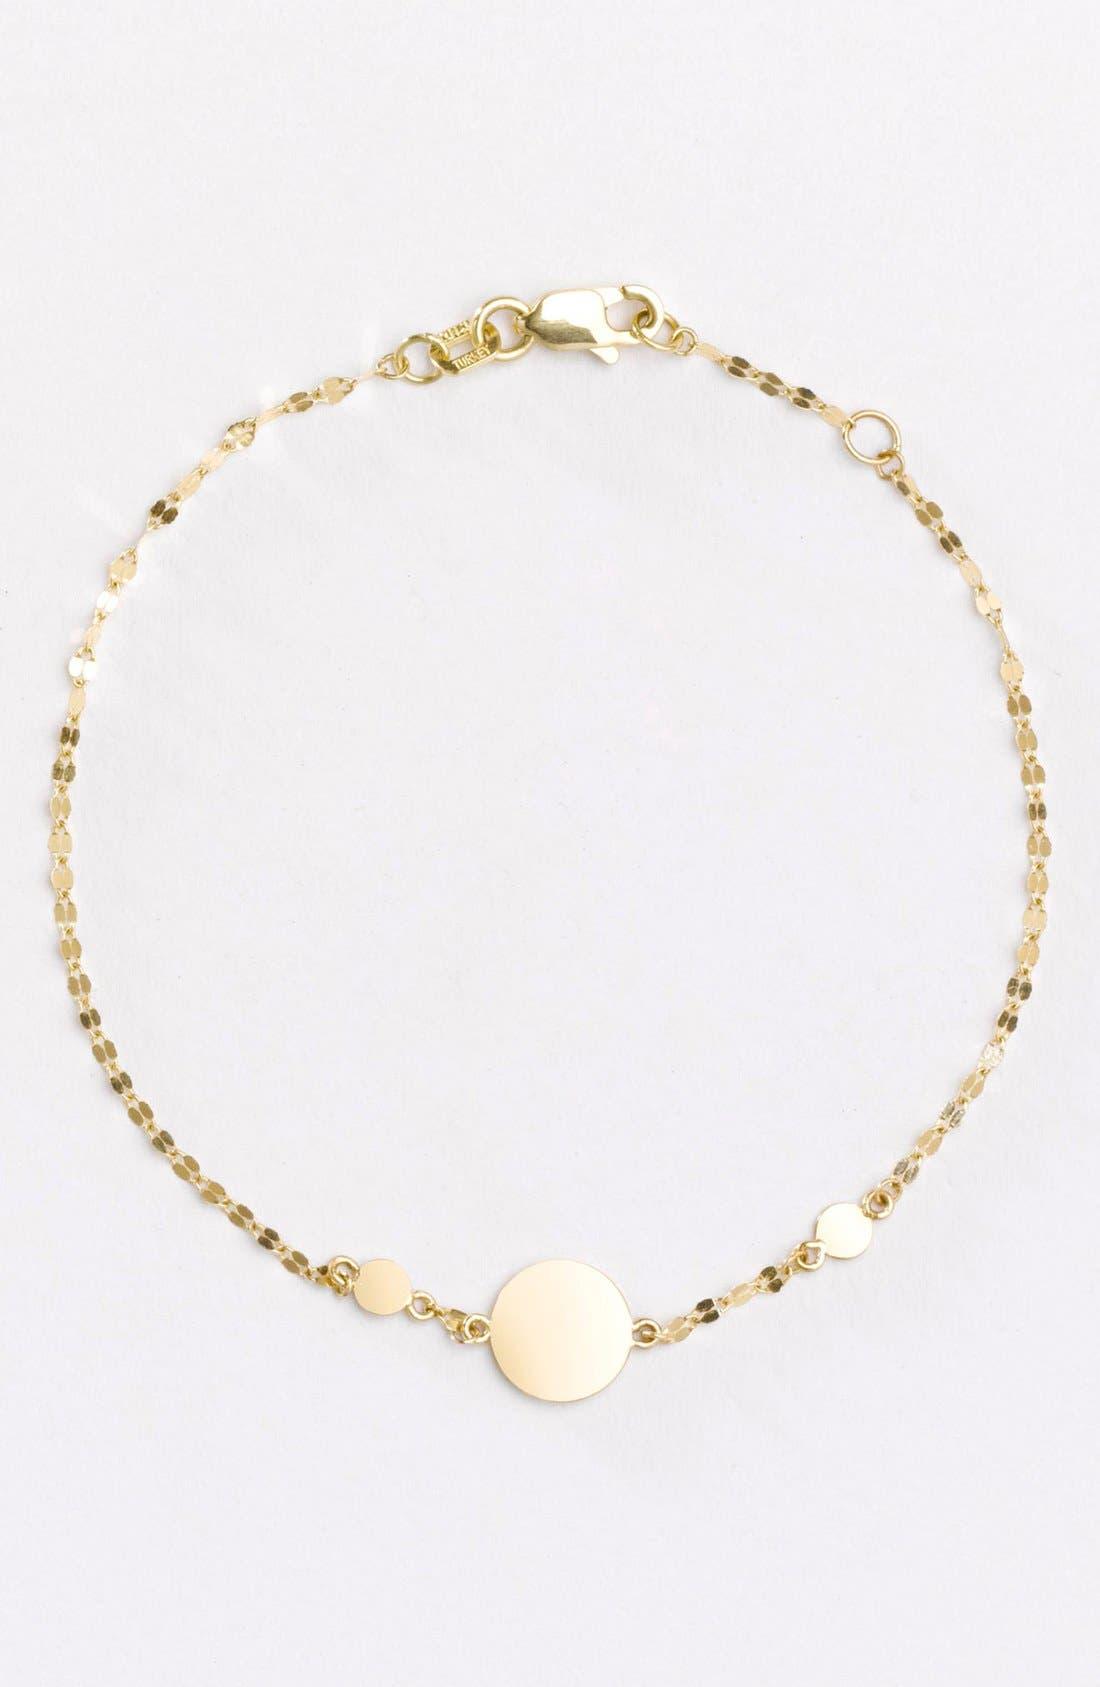 Main Image - Lana Jewelry Disc Station Bracelet